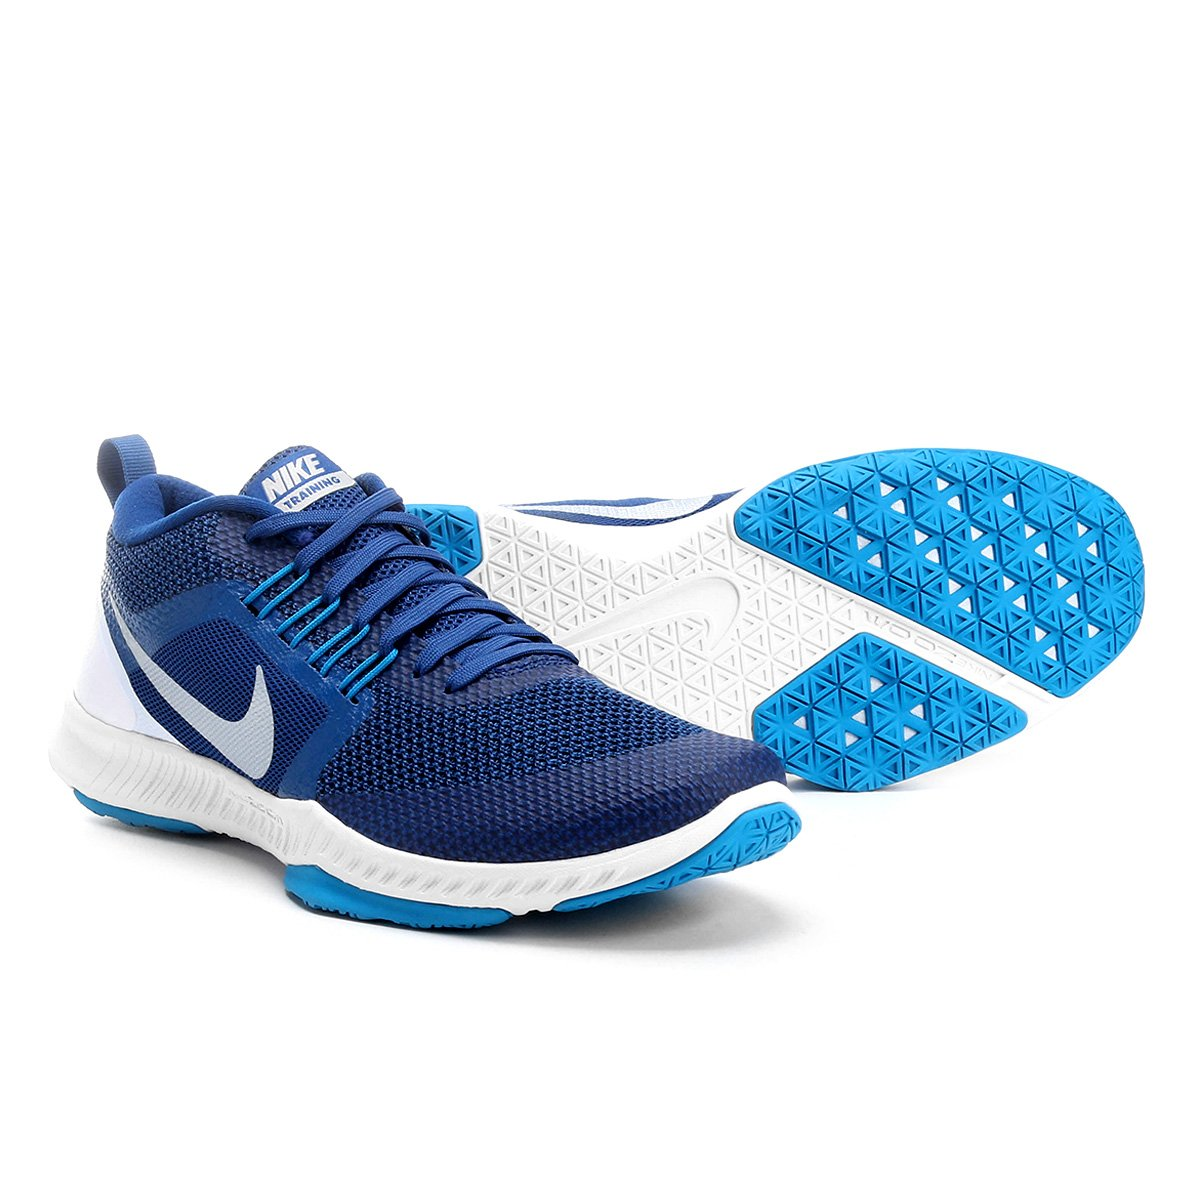 0393062f18f Tênis Nike Zoom Domination TR Masculino - Compre Agora